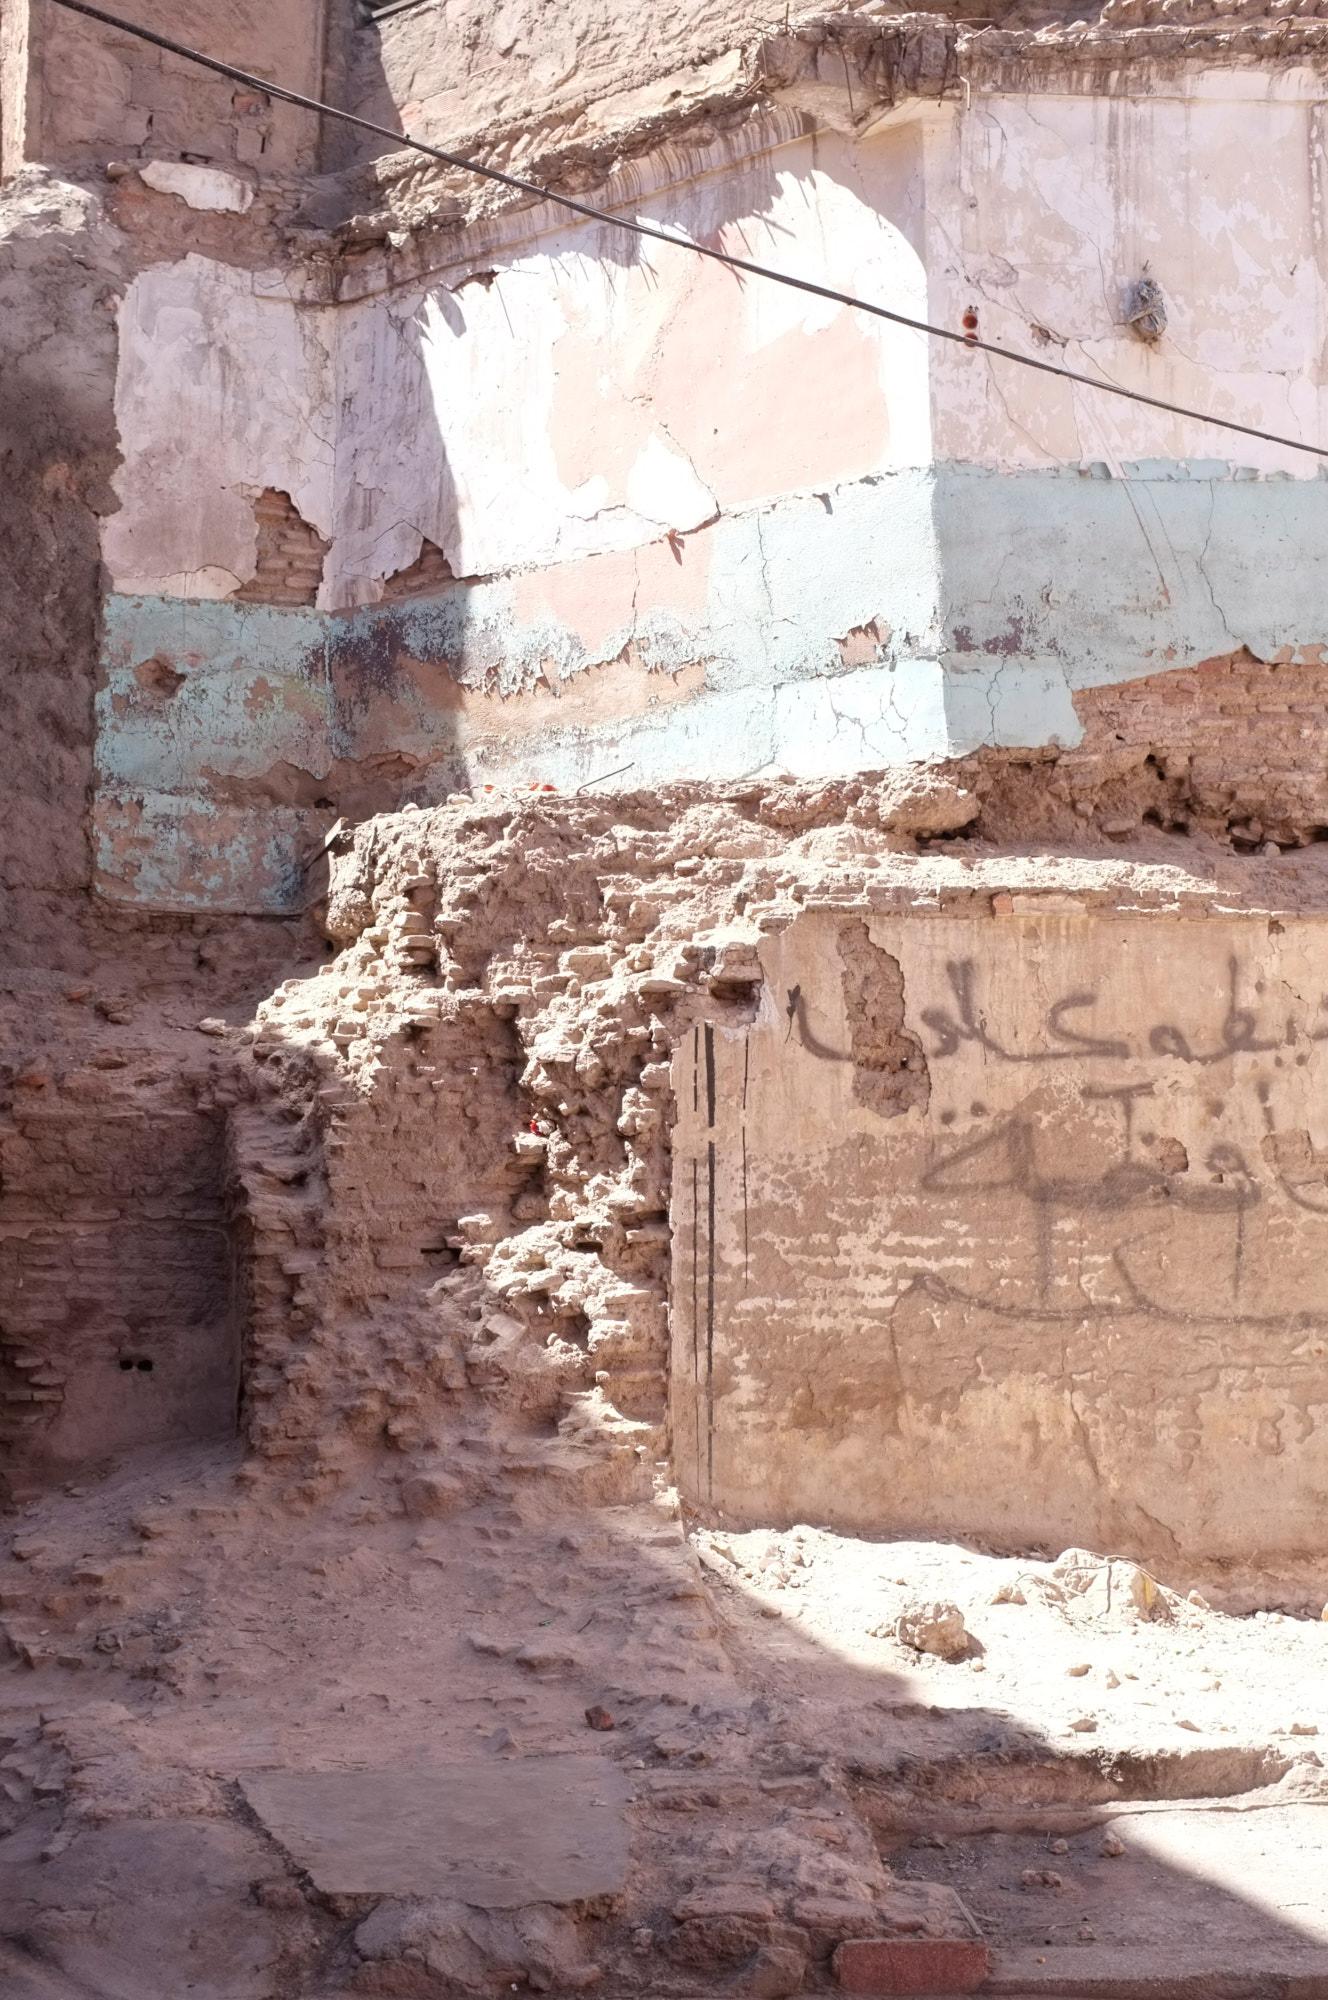 SMCLEOD_Morocco_2016_09_13